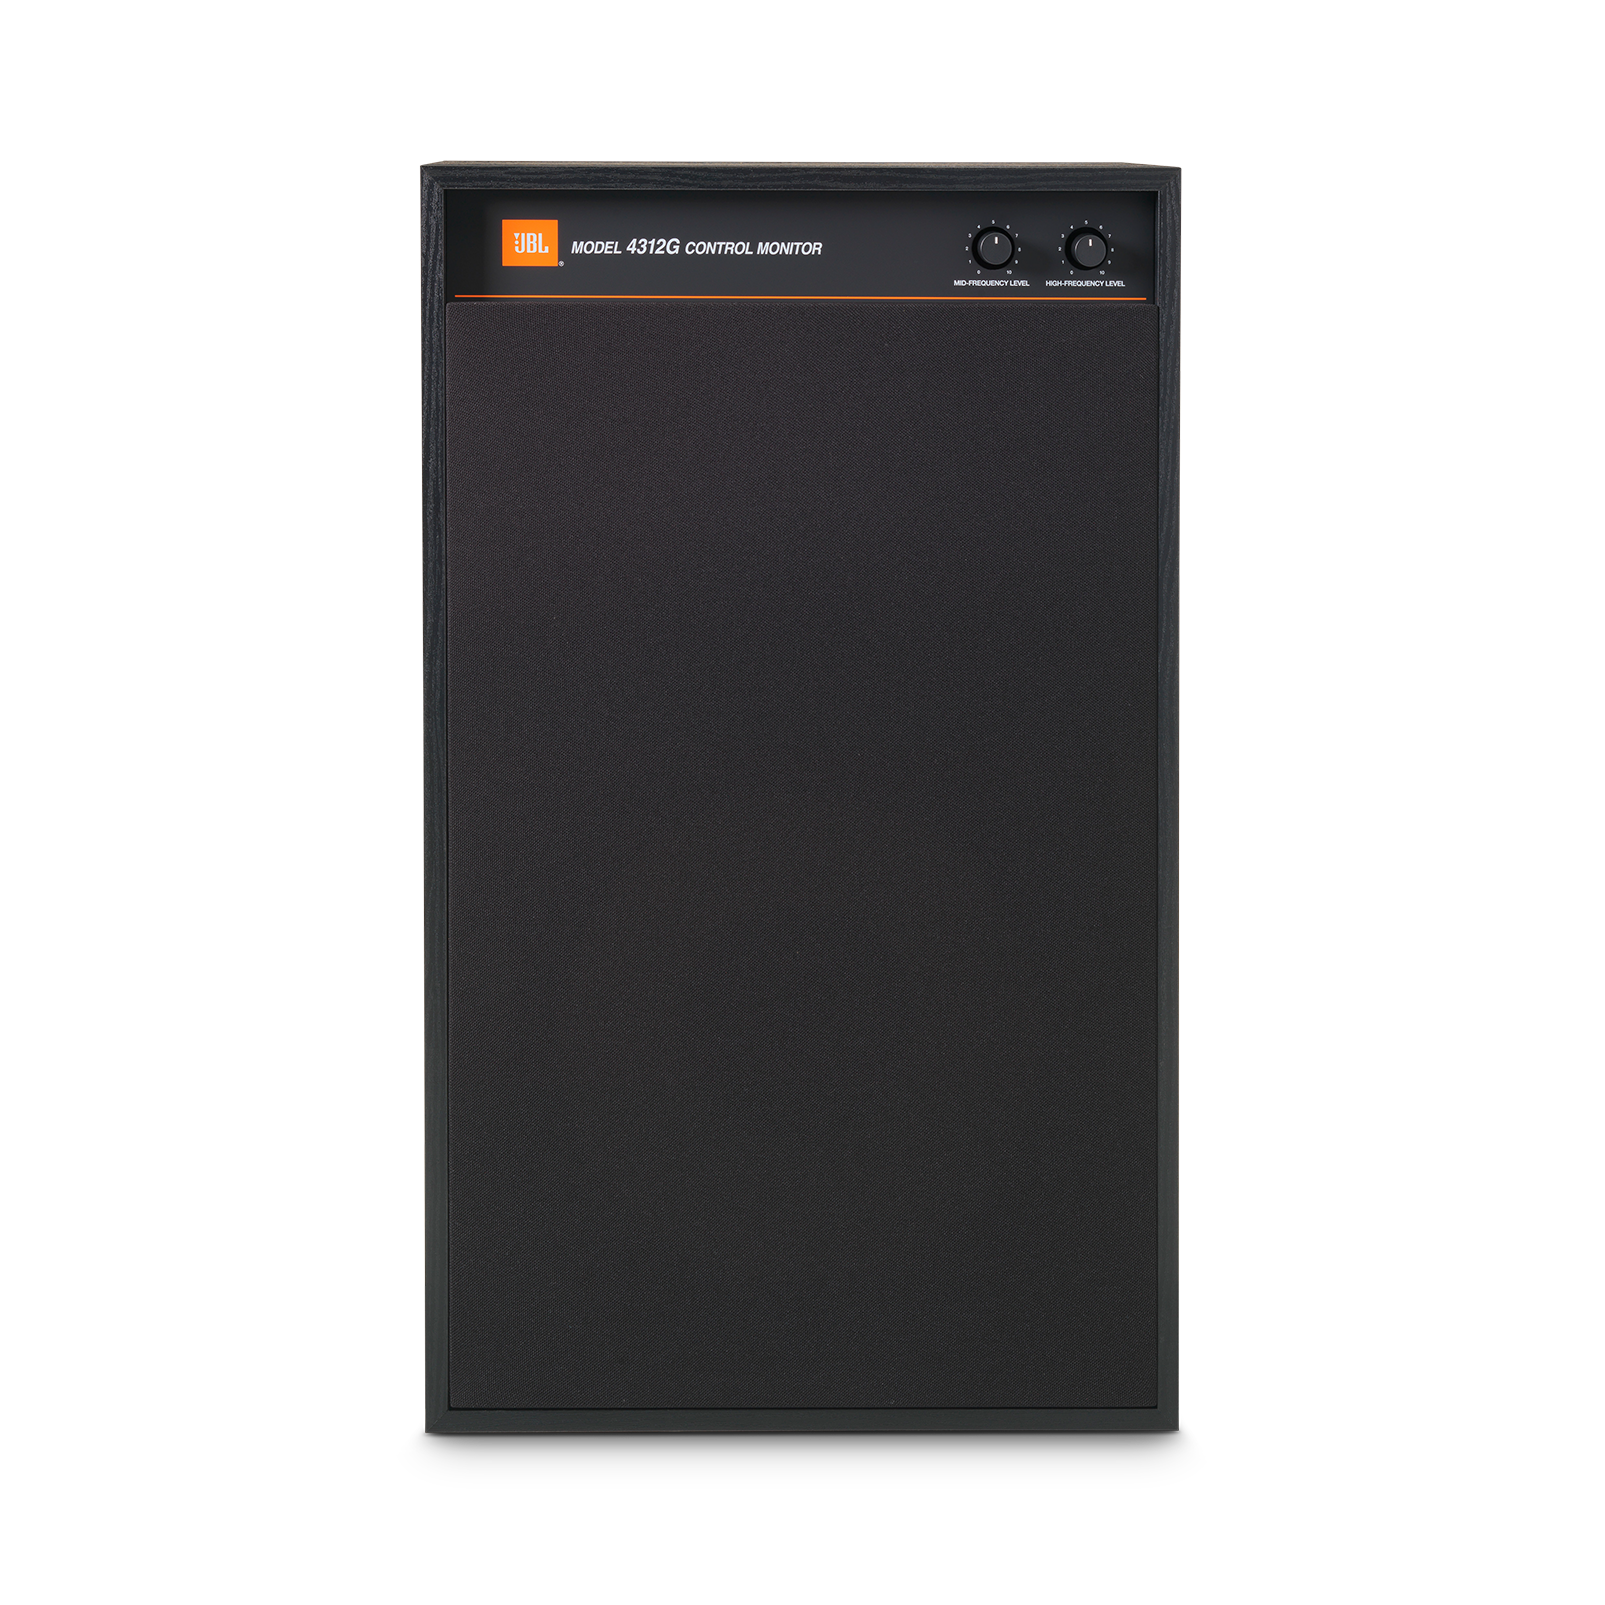 4312G - Black - 12-inch (300mm) 3-way Studio Monitor Bookshelf Loudspeaker - Front